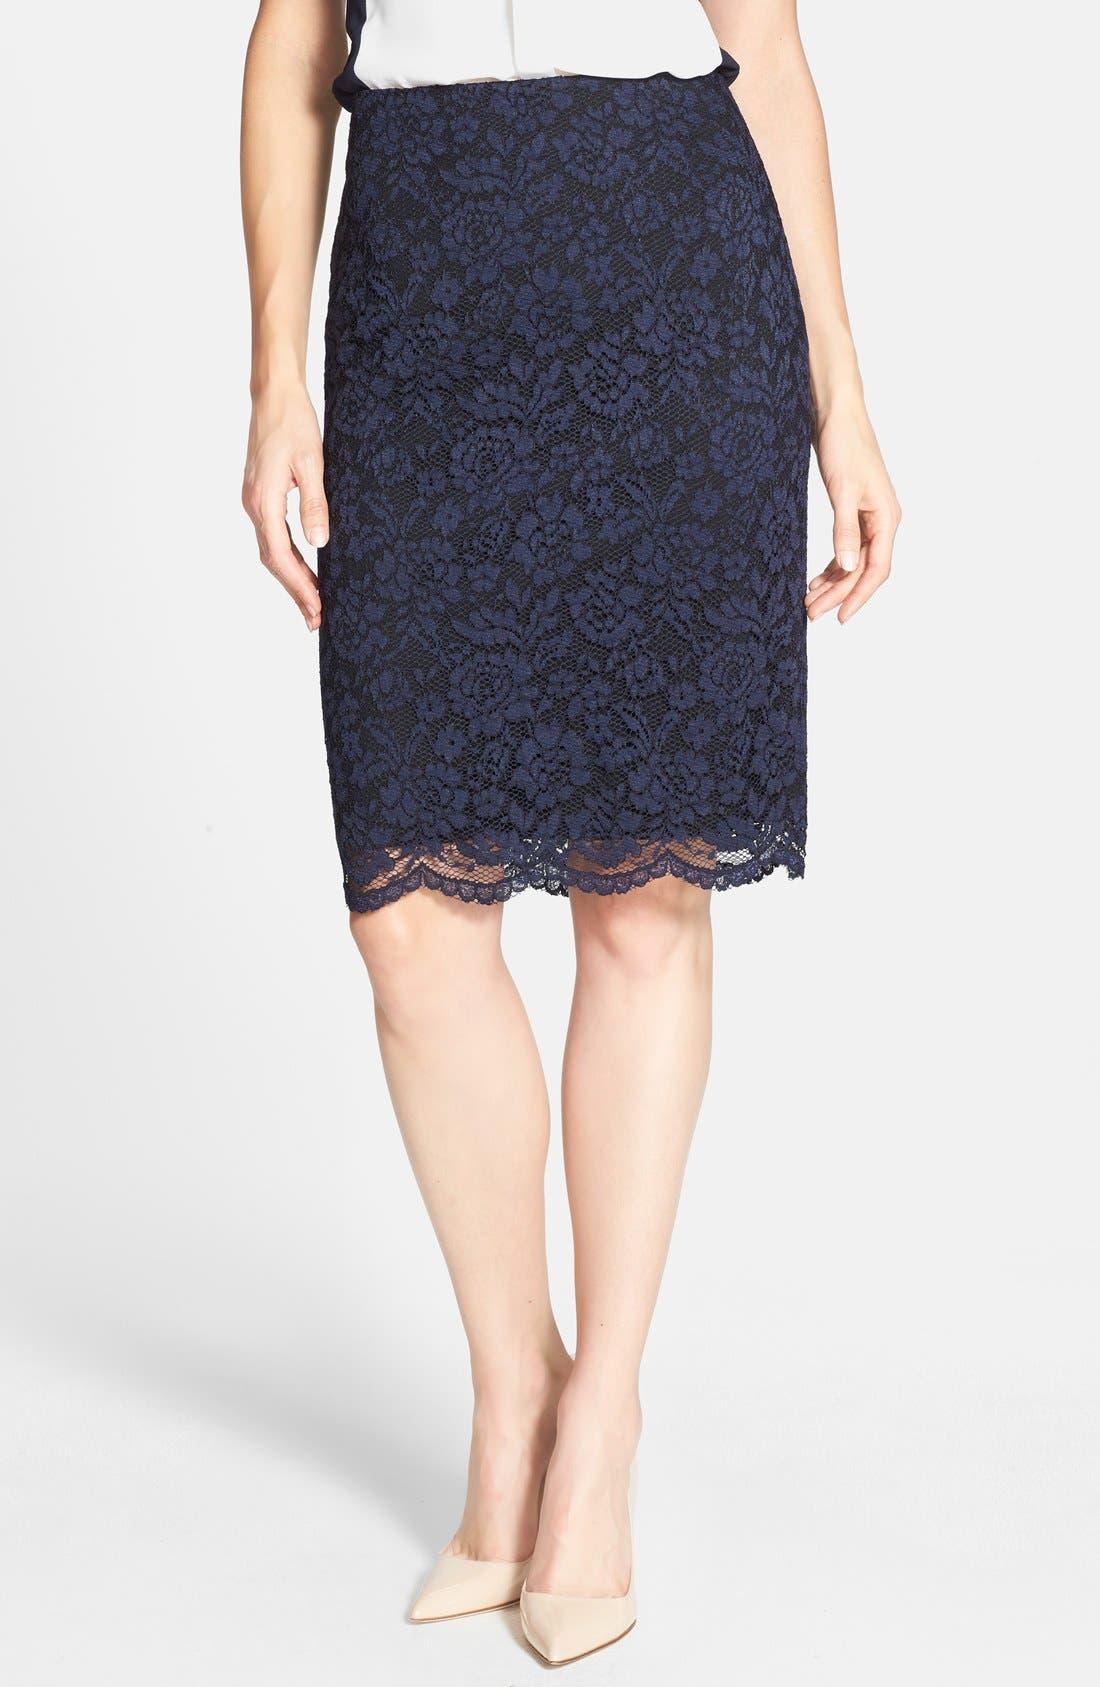 Alternate Image 1 Selected - Vince Camuto Lace Overlay Back Zip Skirt (Regular & Petite)